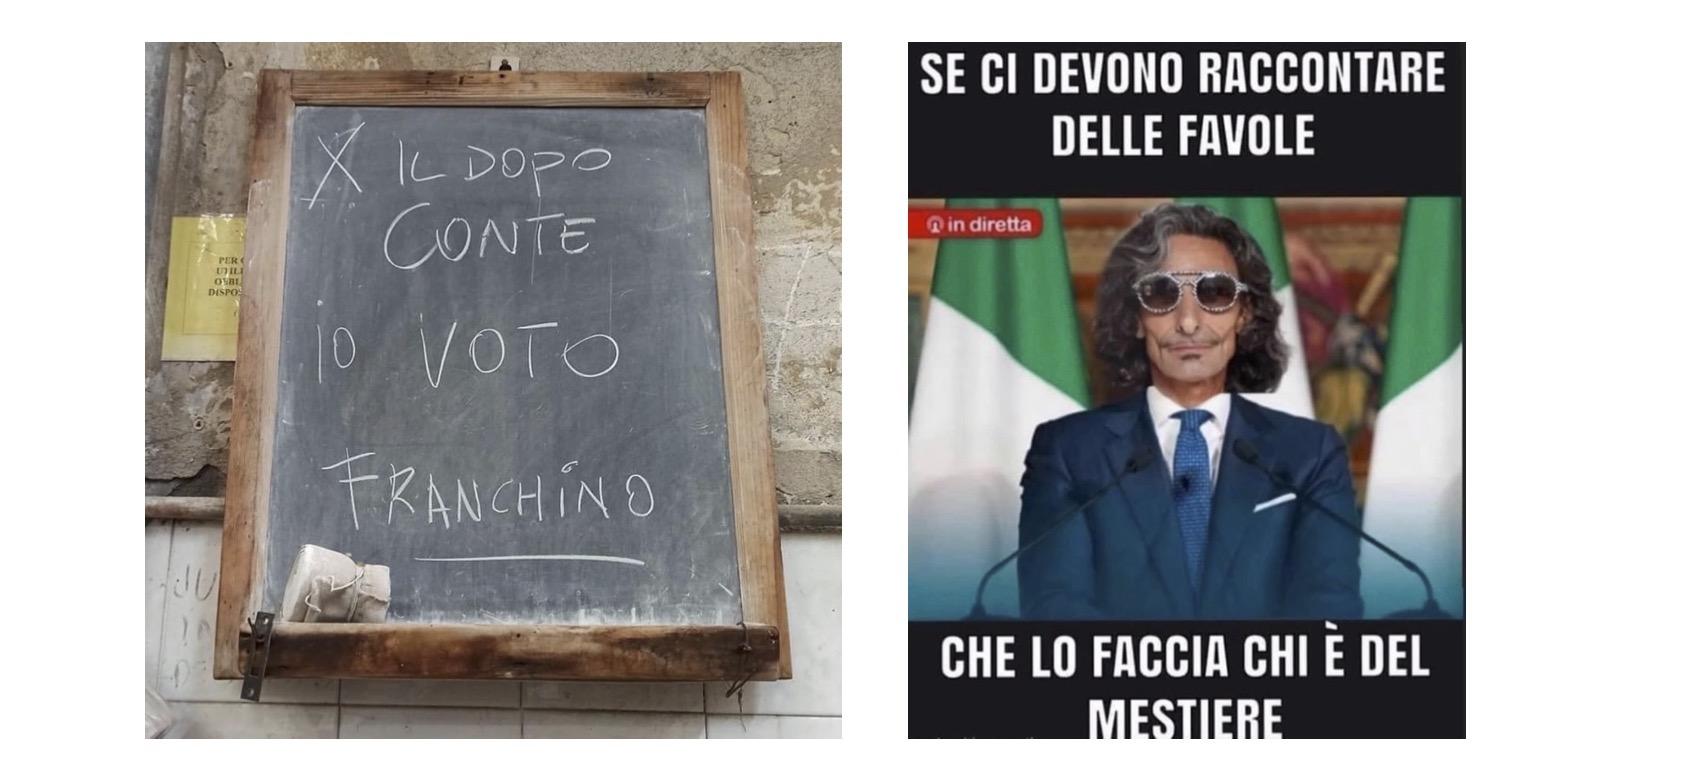 Franchino - AllaDisco NO - AllaDiscoteca